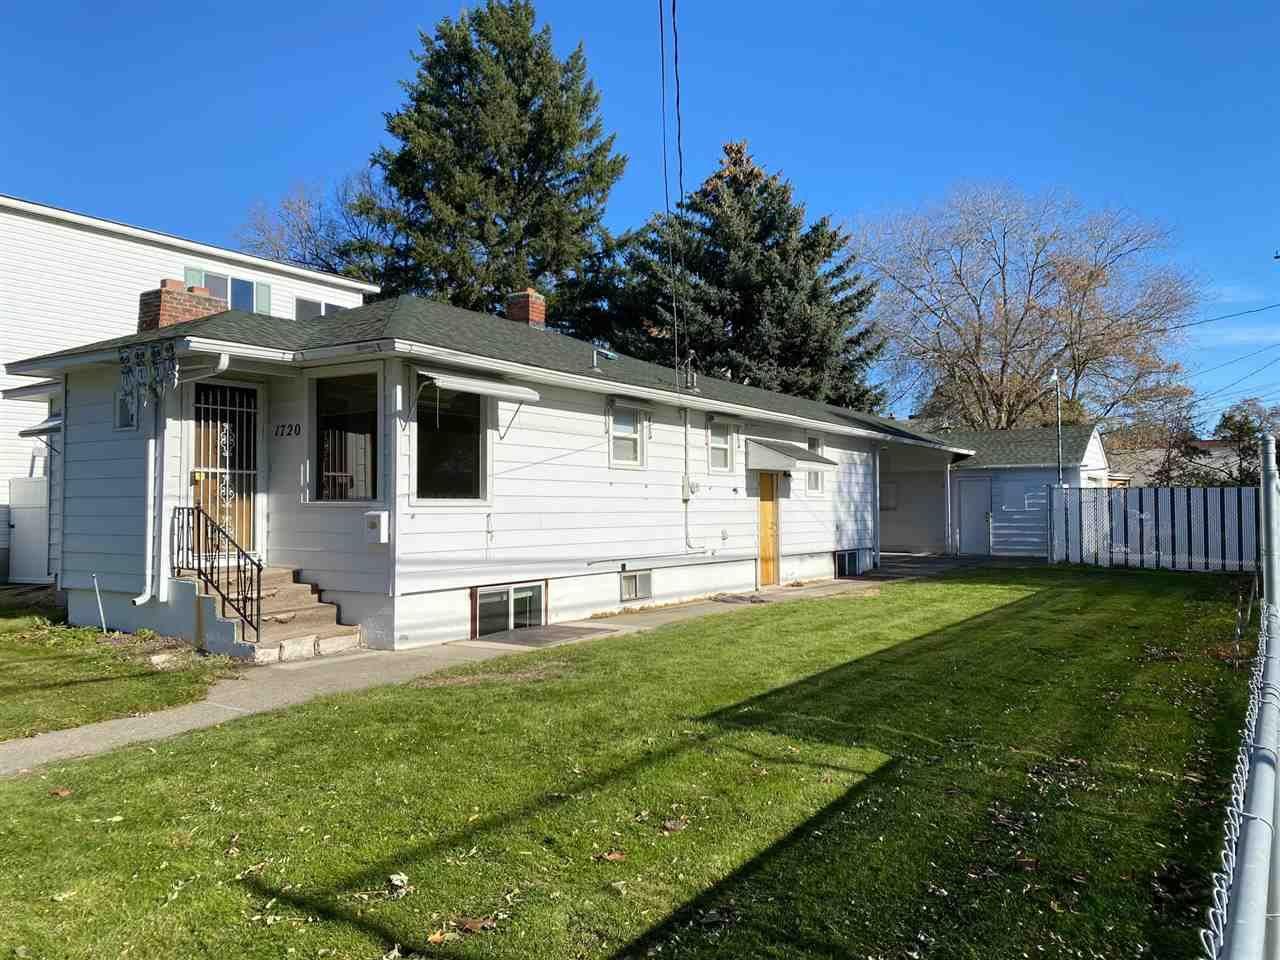 1720 N Standard St, Spokane, WA 99207 - #: 202024391